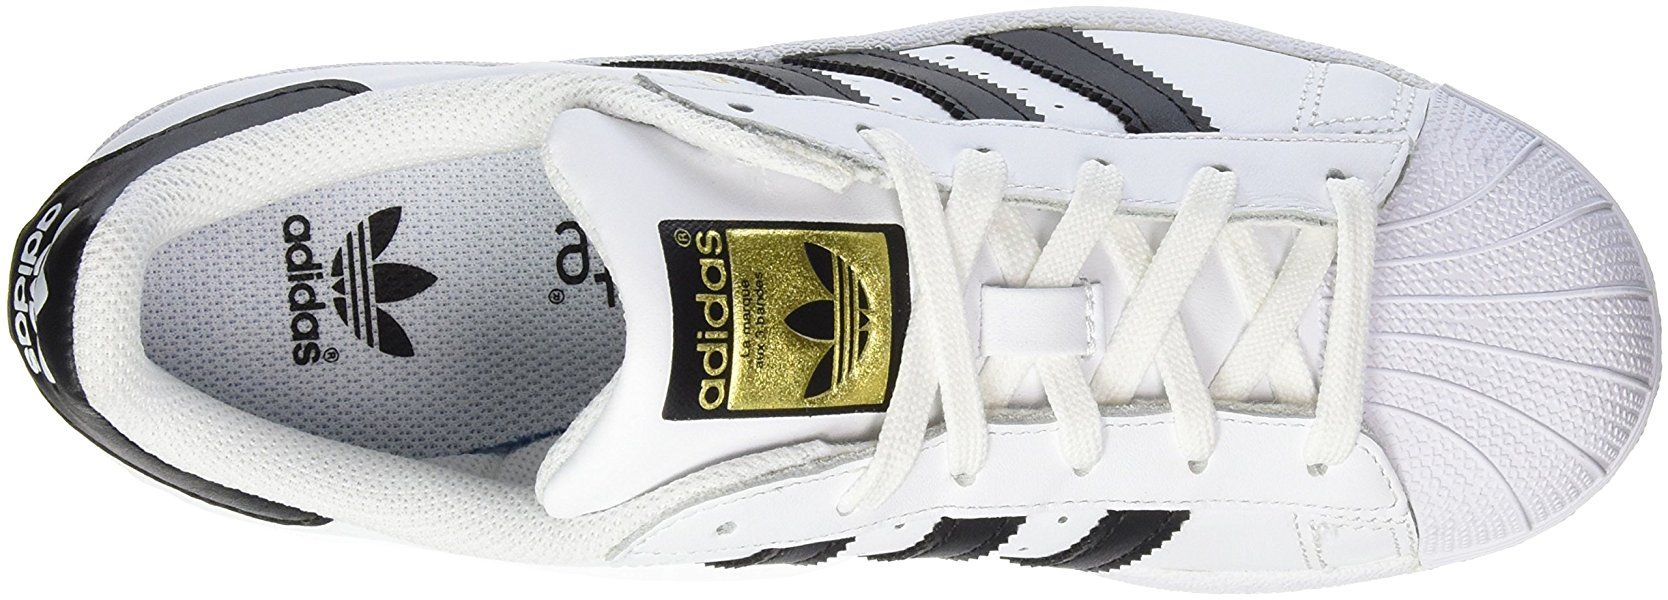 the best attitude 75b5b 2a2df Adidas Originals Superstar, Chaussures Sneaker Mixte Enfant - Blanc (ftwr  White core Black